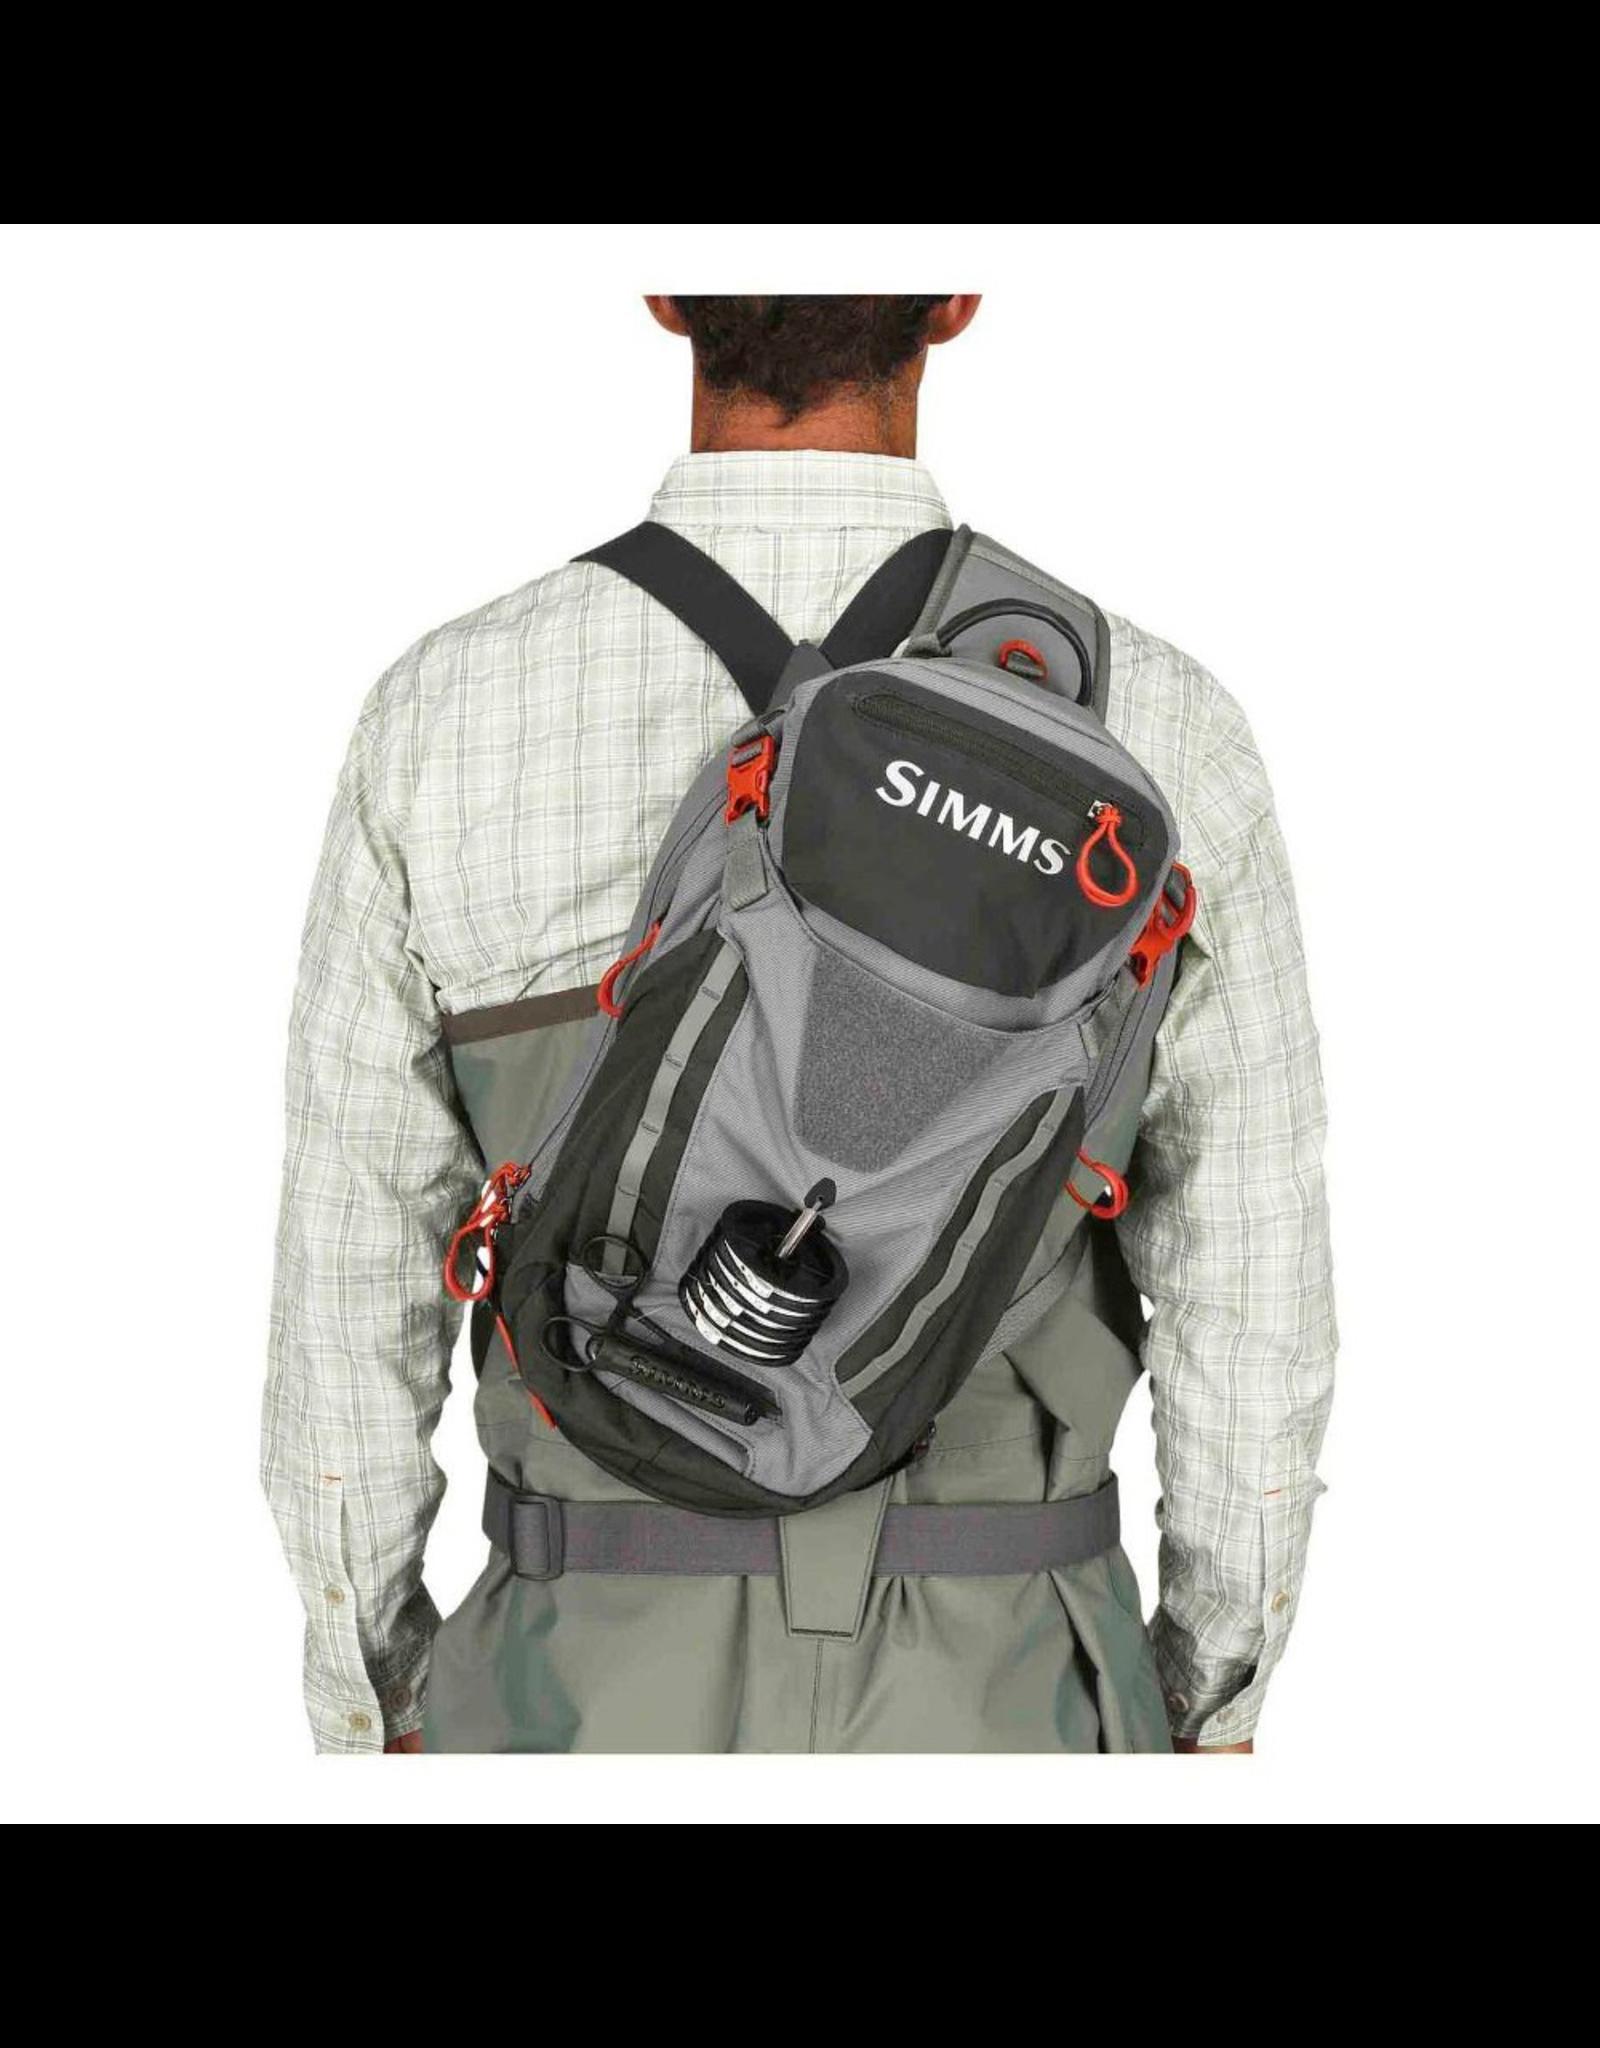 Simms Simms Freestone Ambidextrous Fishing Sling Pack